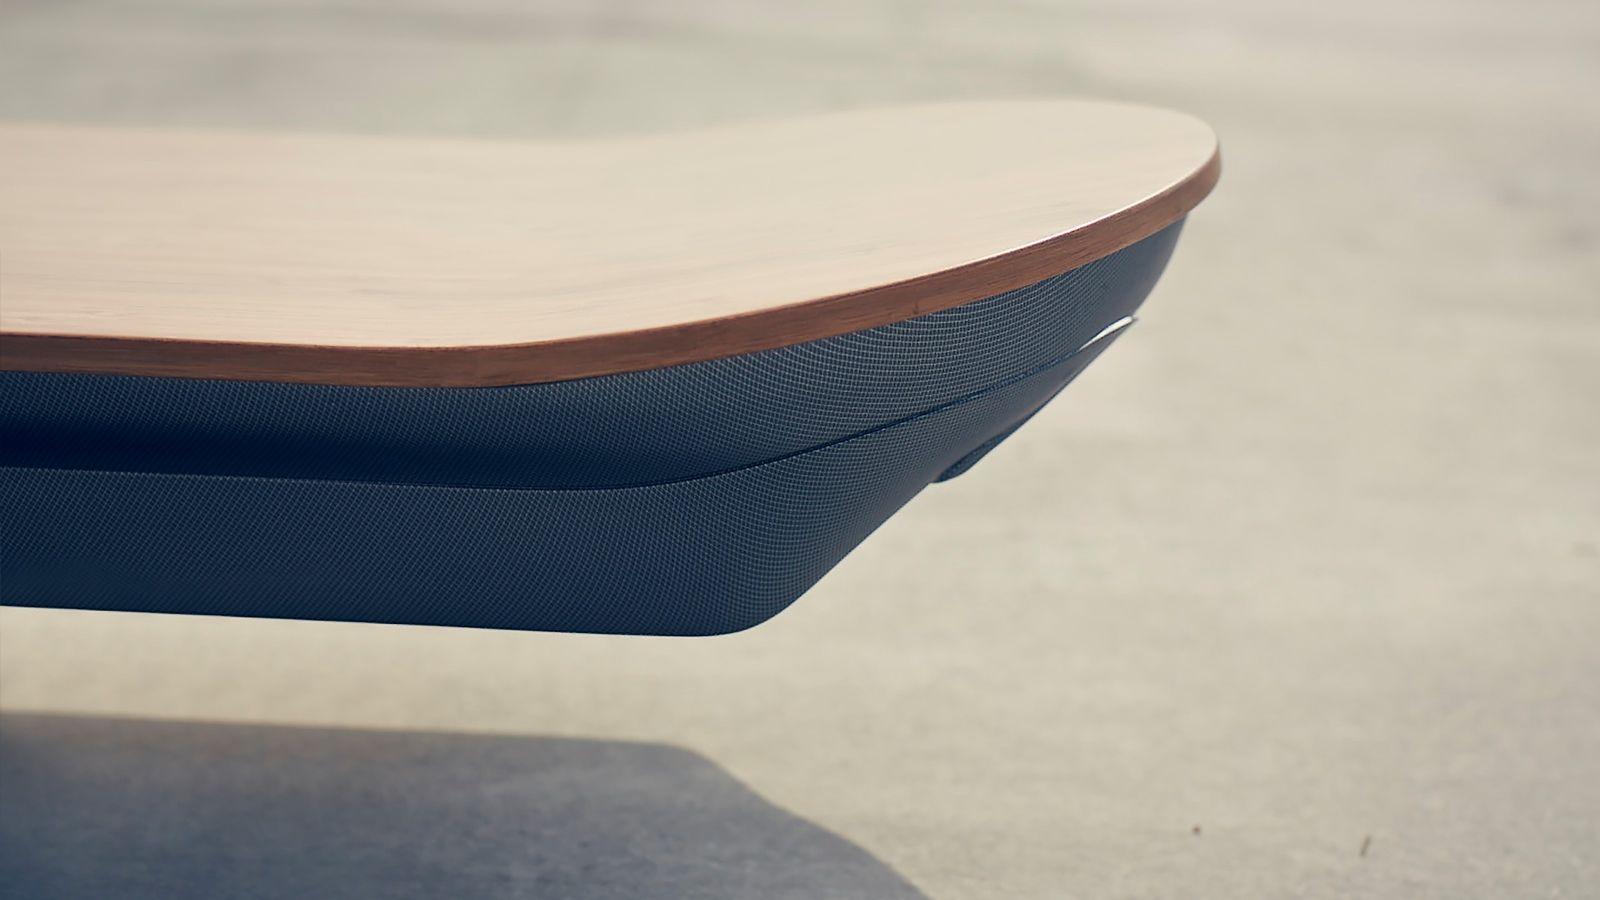 le hoverboard de lexus exemple d 39 objet fantasm des marques perspectives. Black Bedroom Furniture Sets. Home Design Ideas